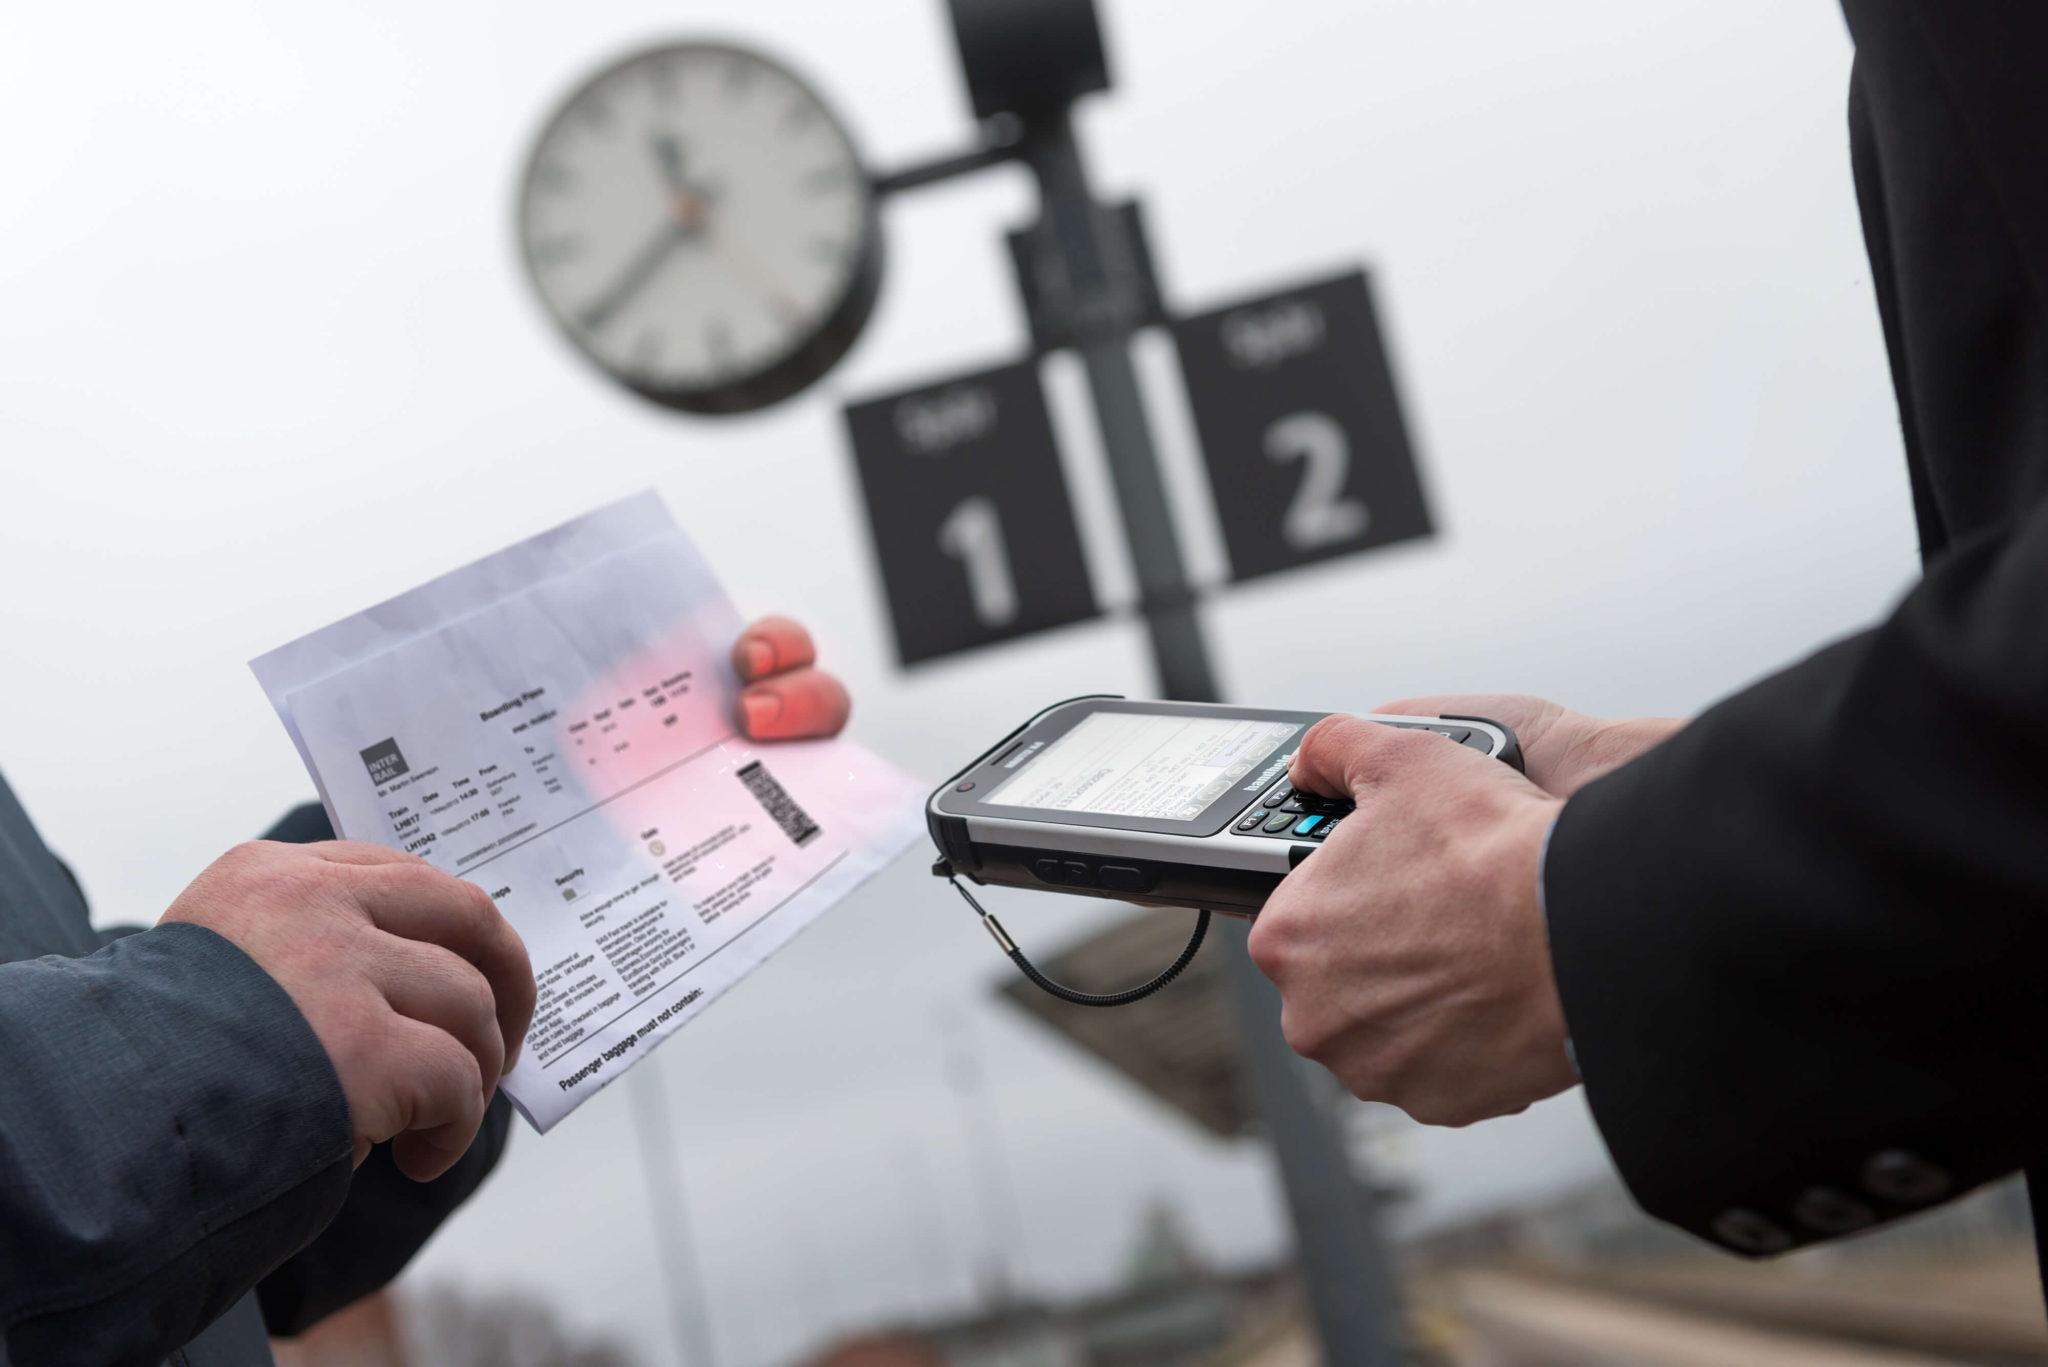 nautiz-eticket-pro-ii-rugged-ticket-control-payment-transactions